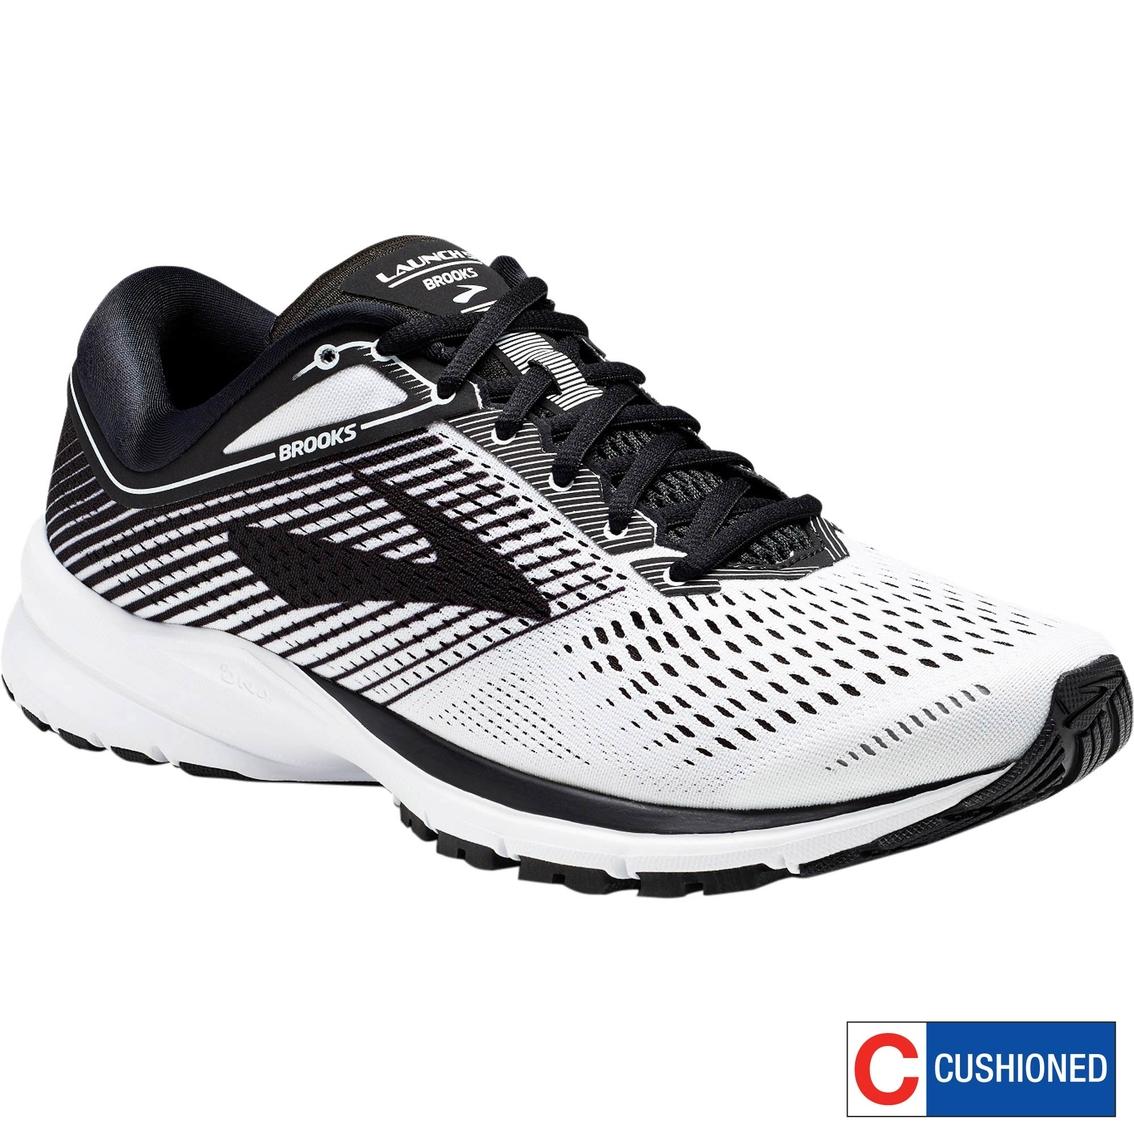 Brooks Men's Launch 5 Running Shoes